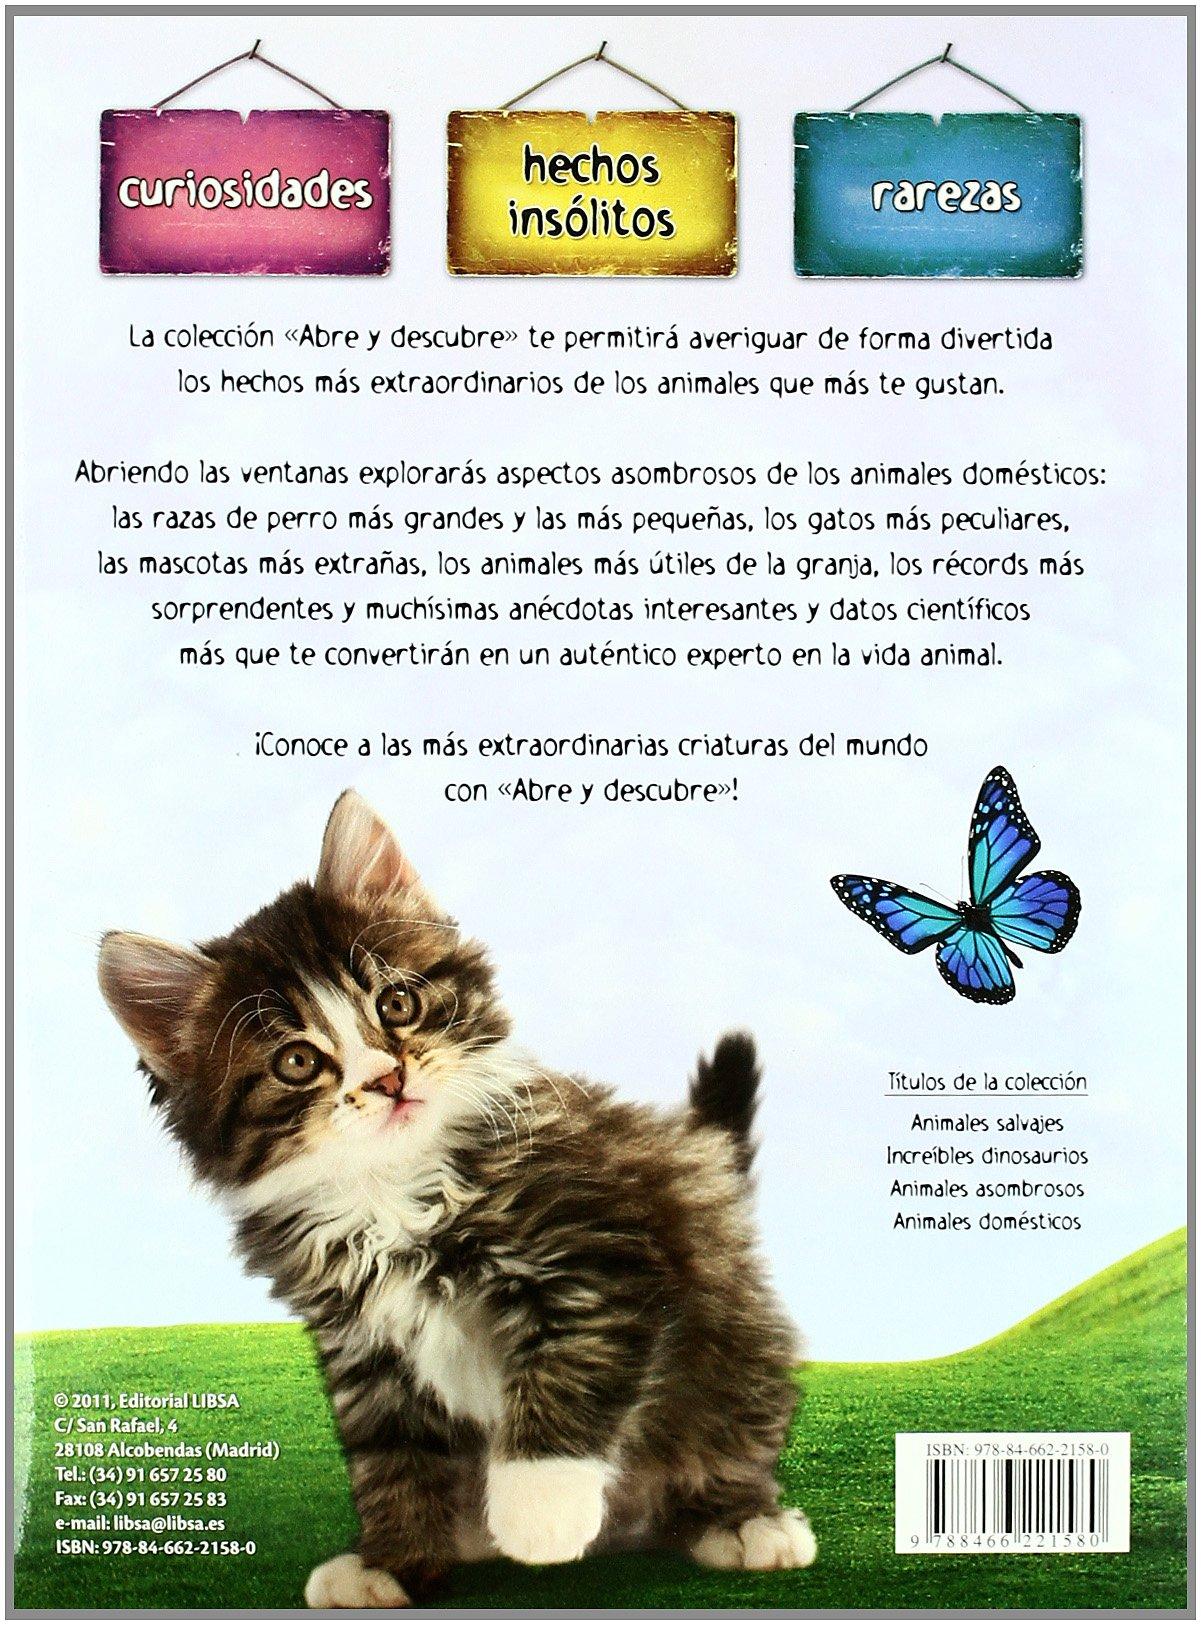 Animales domesticos / Pets (Spanish Edition): María Mañeru: 9788466221580: Amazon.com: Books